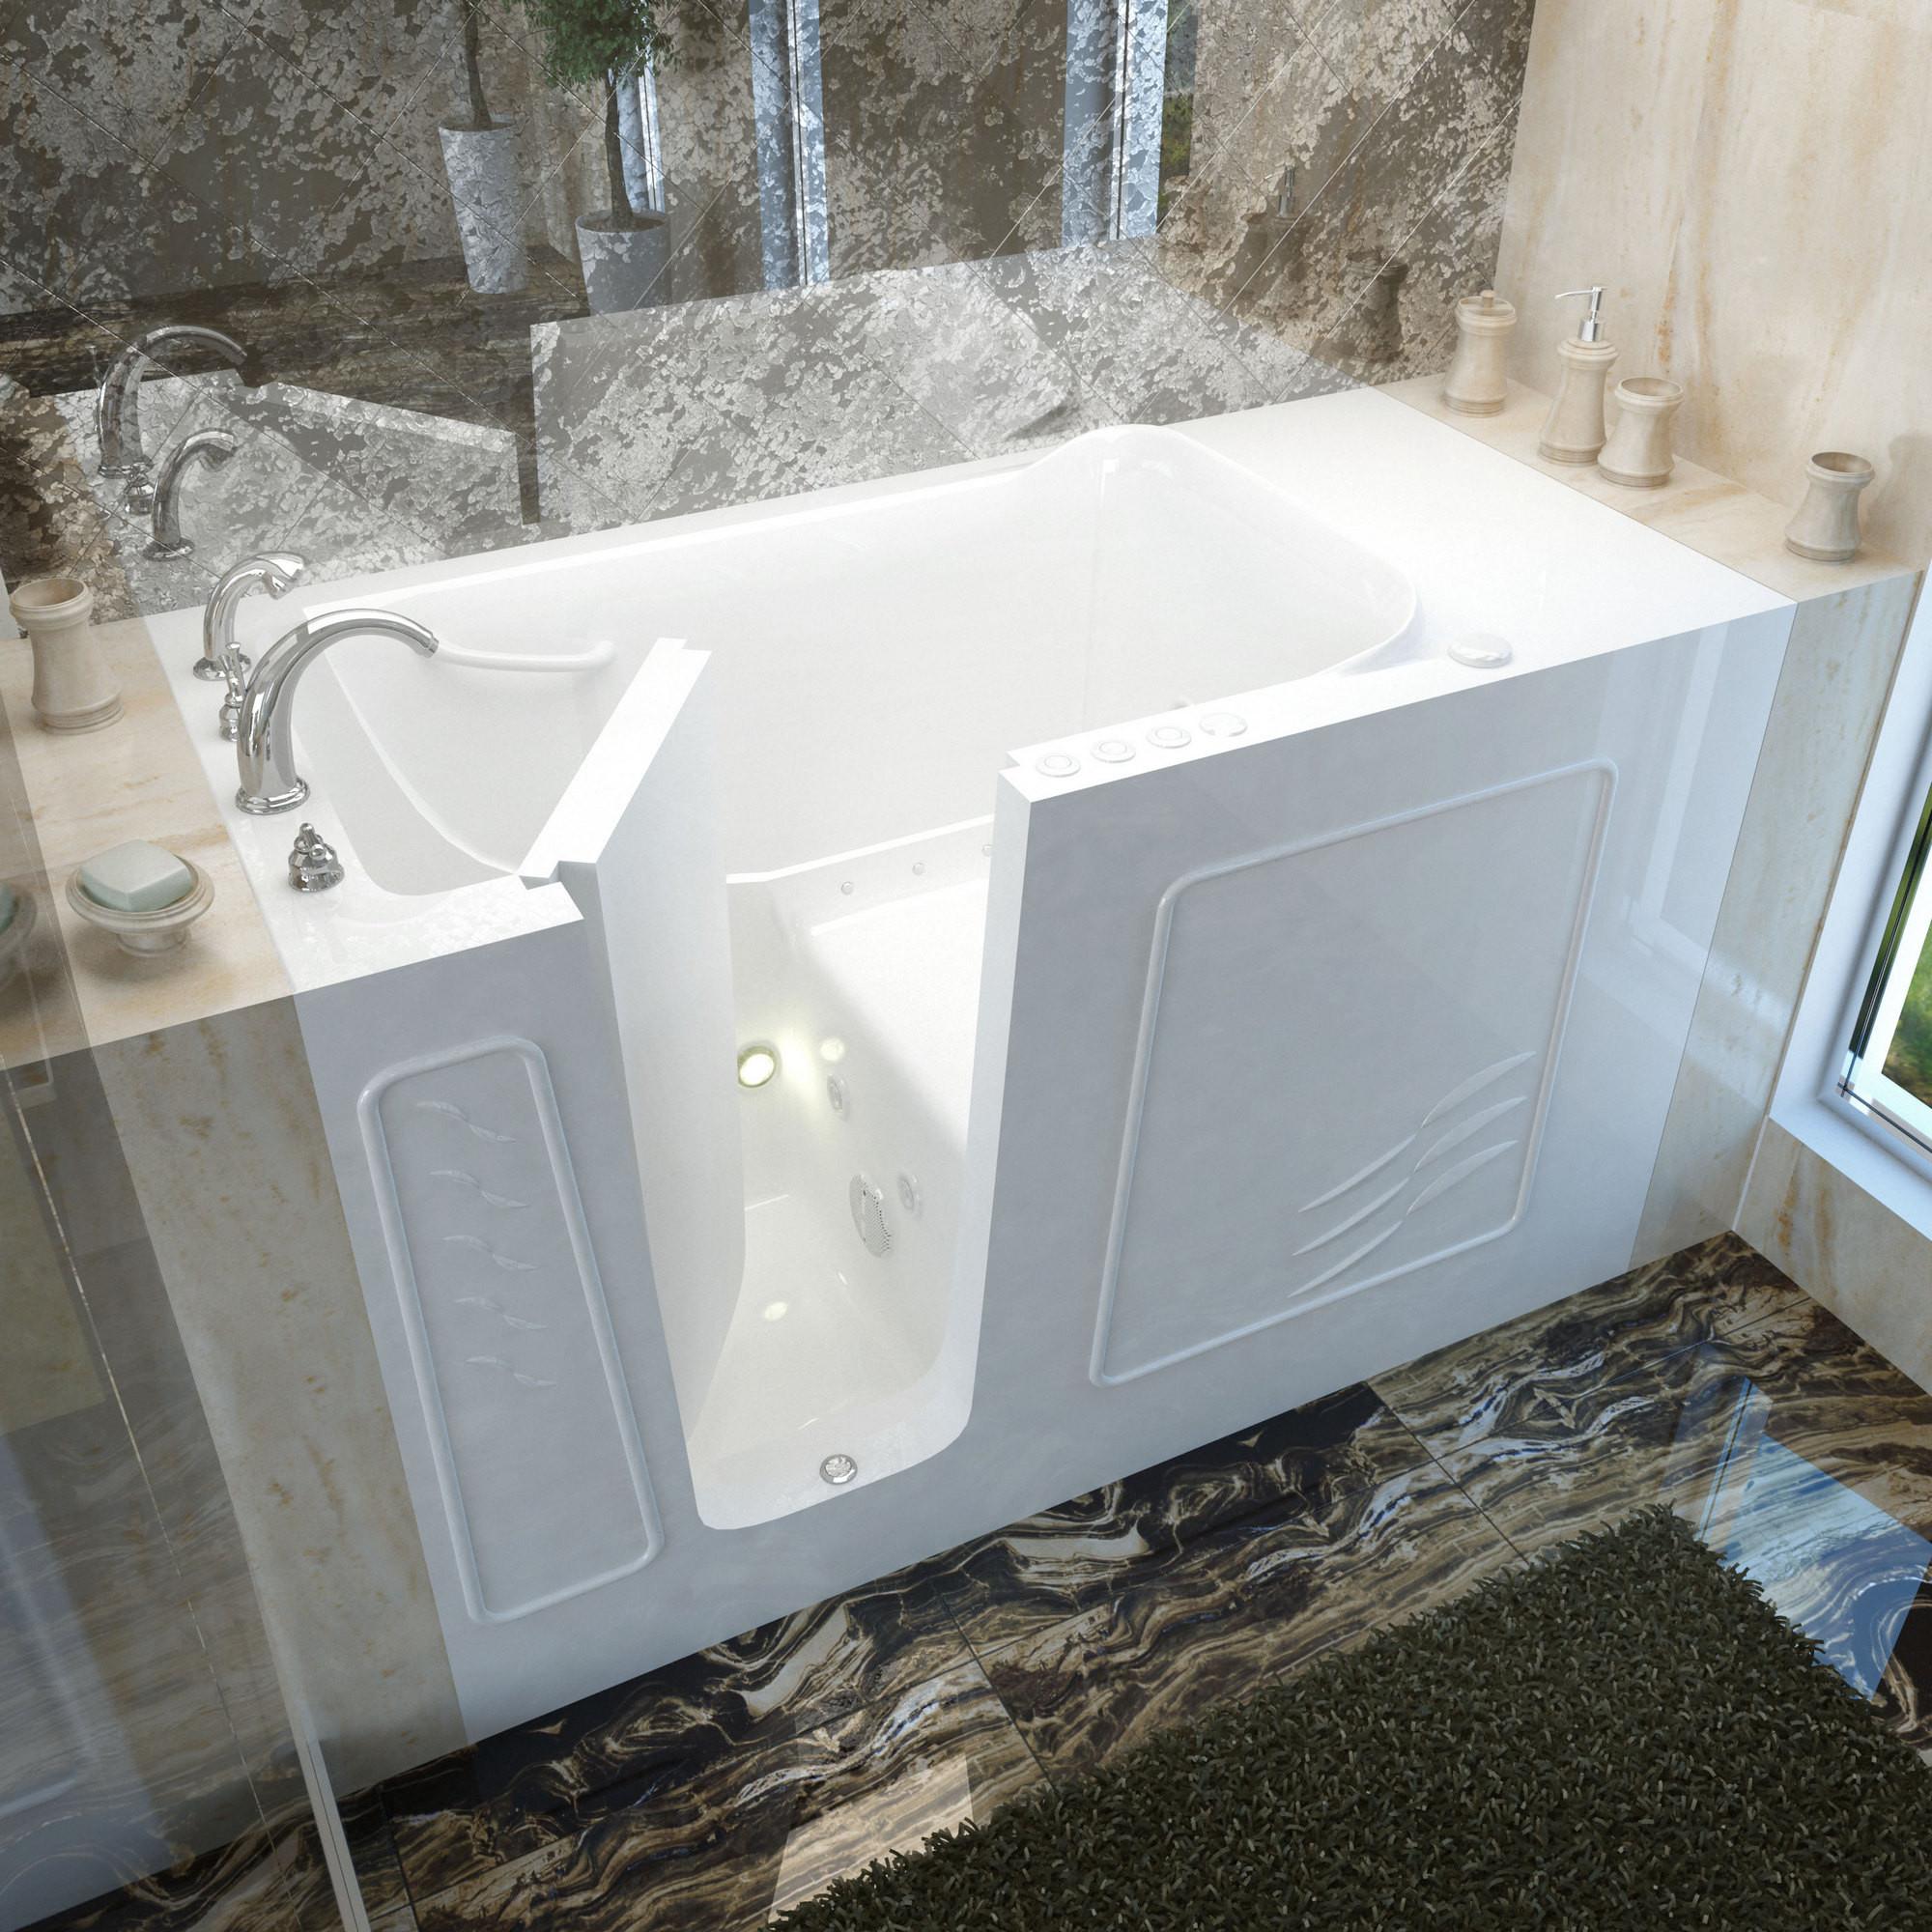 MediTub 3060WILWD Walk-In Left Drain White Whirlpool & Air Jetted Bathtub